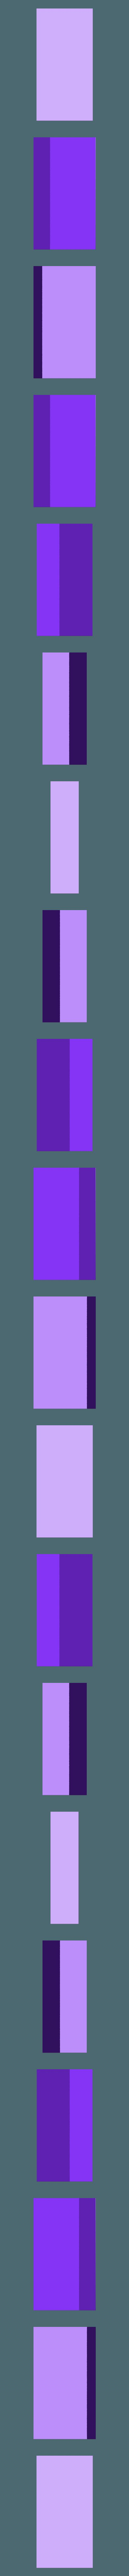 Pokemon_Trainer_blue.stl Download free STL file Pokemon Trainer • 3D printer design, countingendlessrepetition